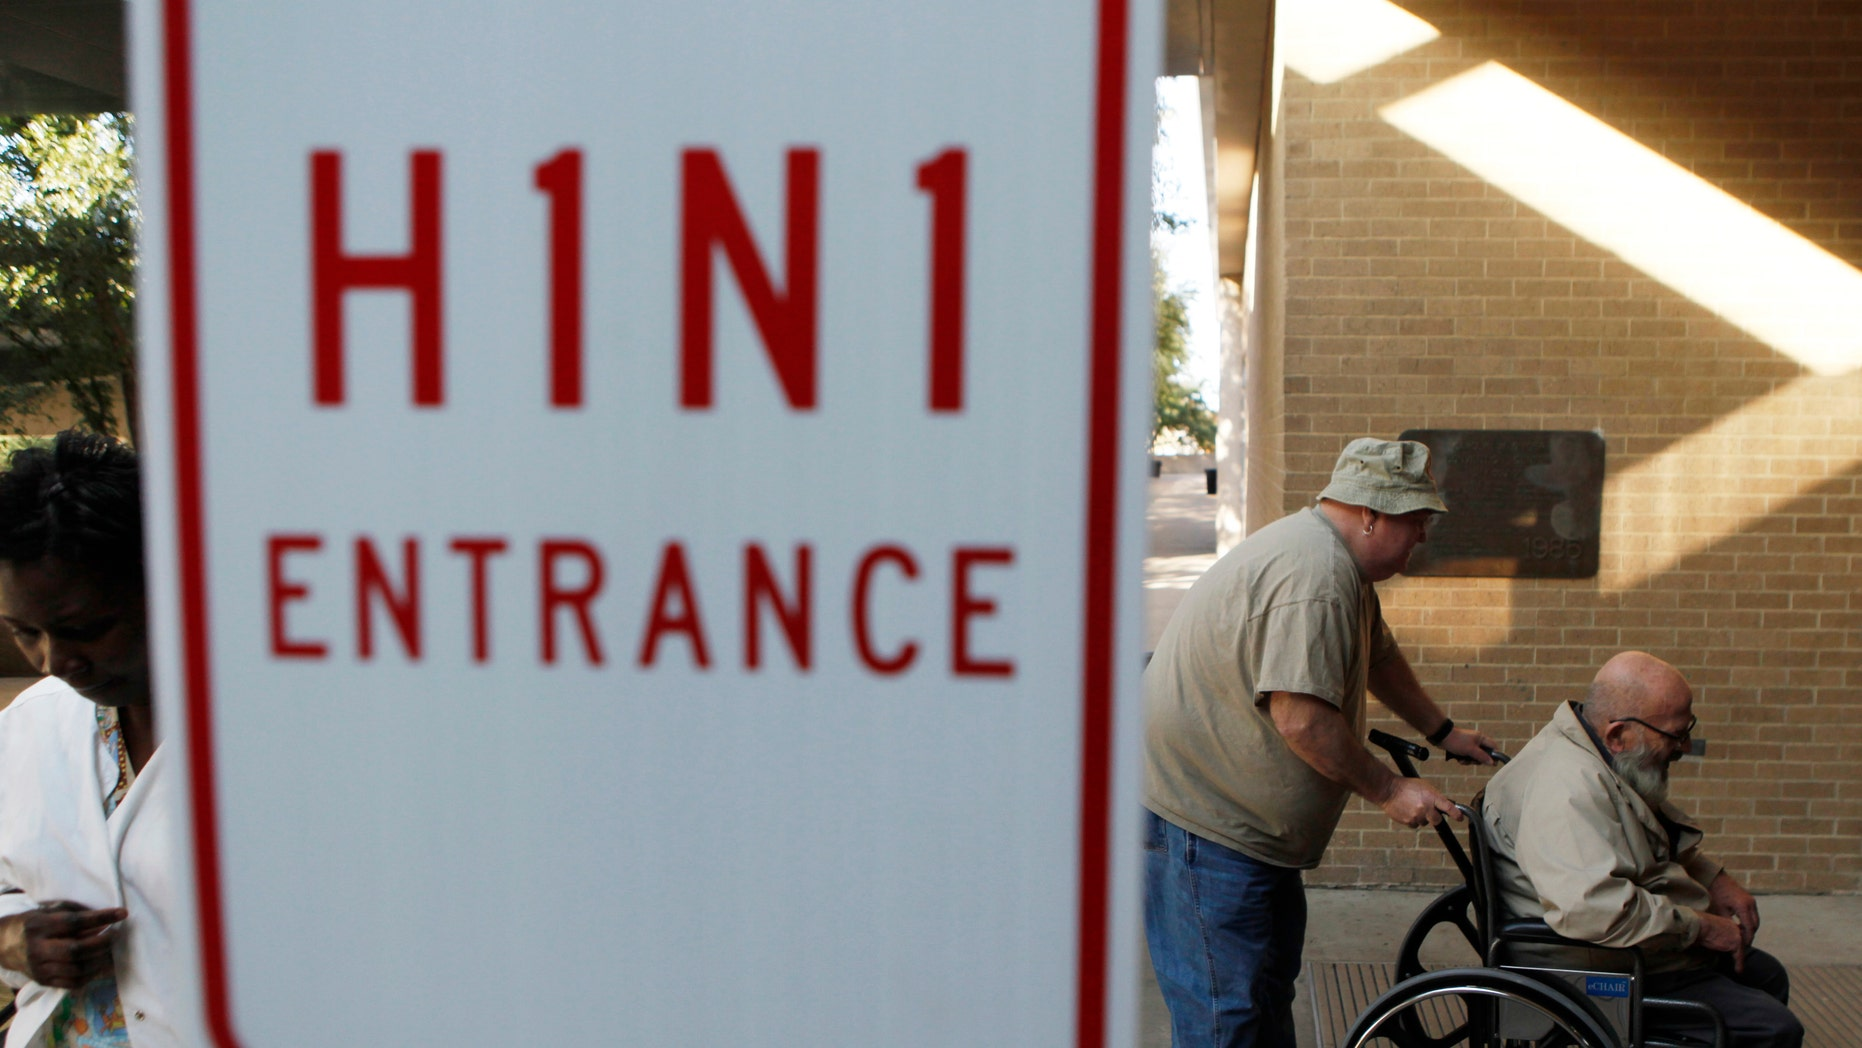 Men enter the Arlington Convention Center to receive their H1N1 flu vaccinations in Arlington, Texas November 24, 2009. (REUTERS/Jessica Rinaldi)